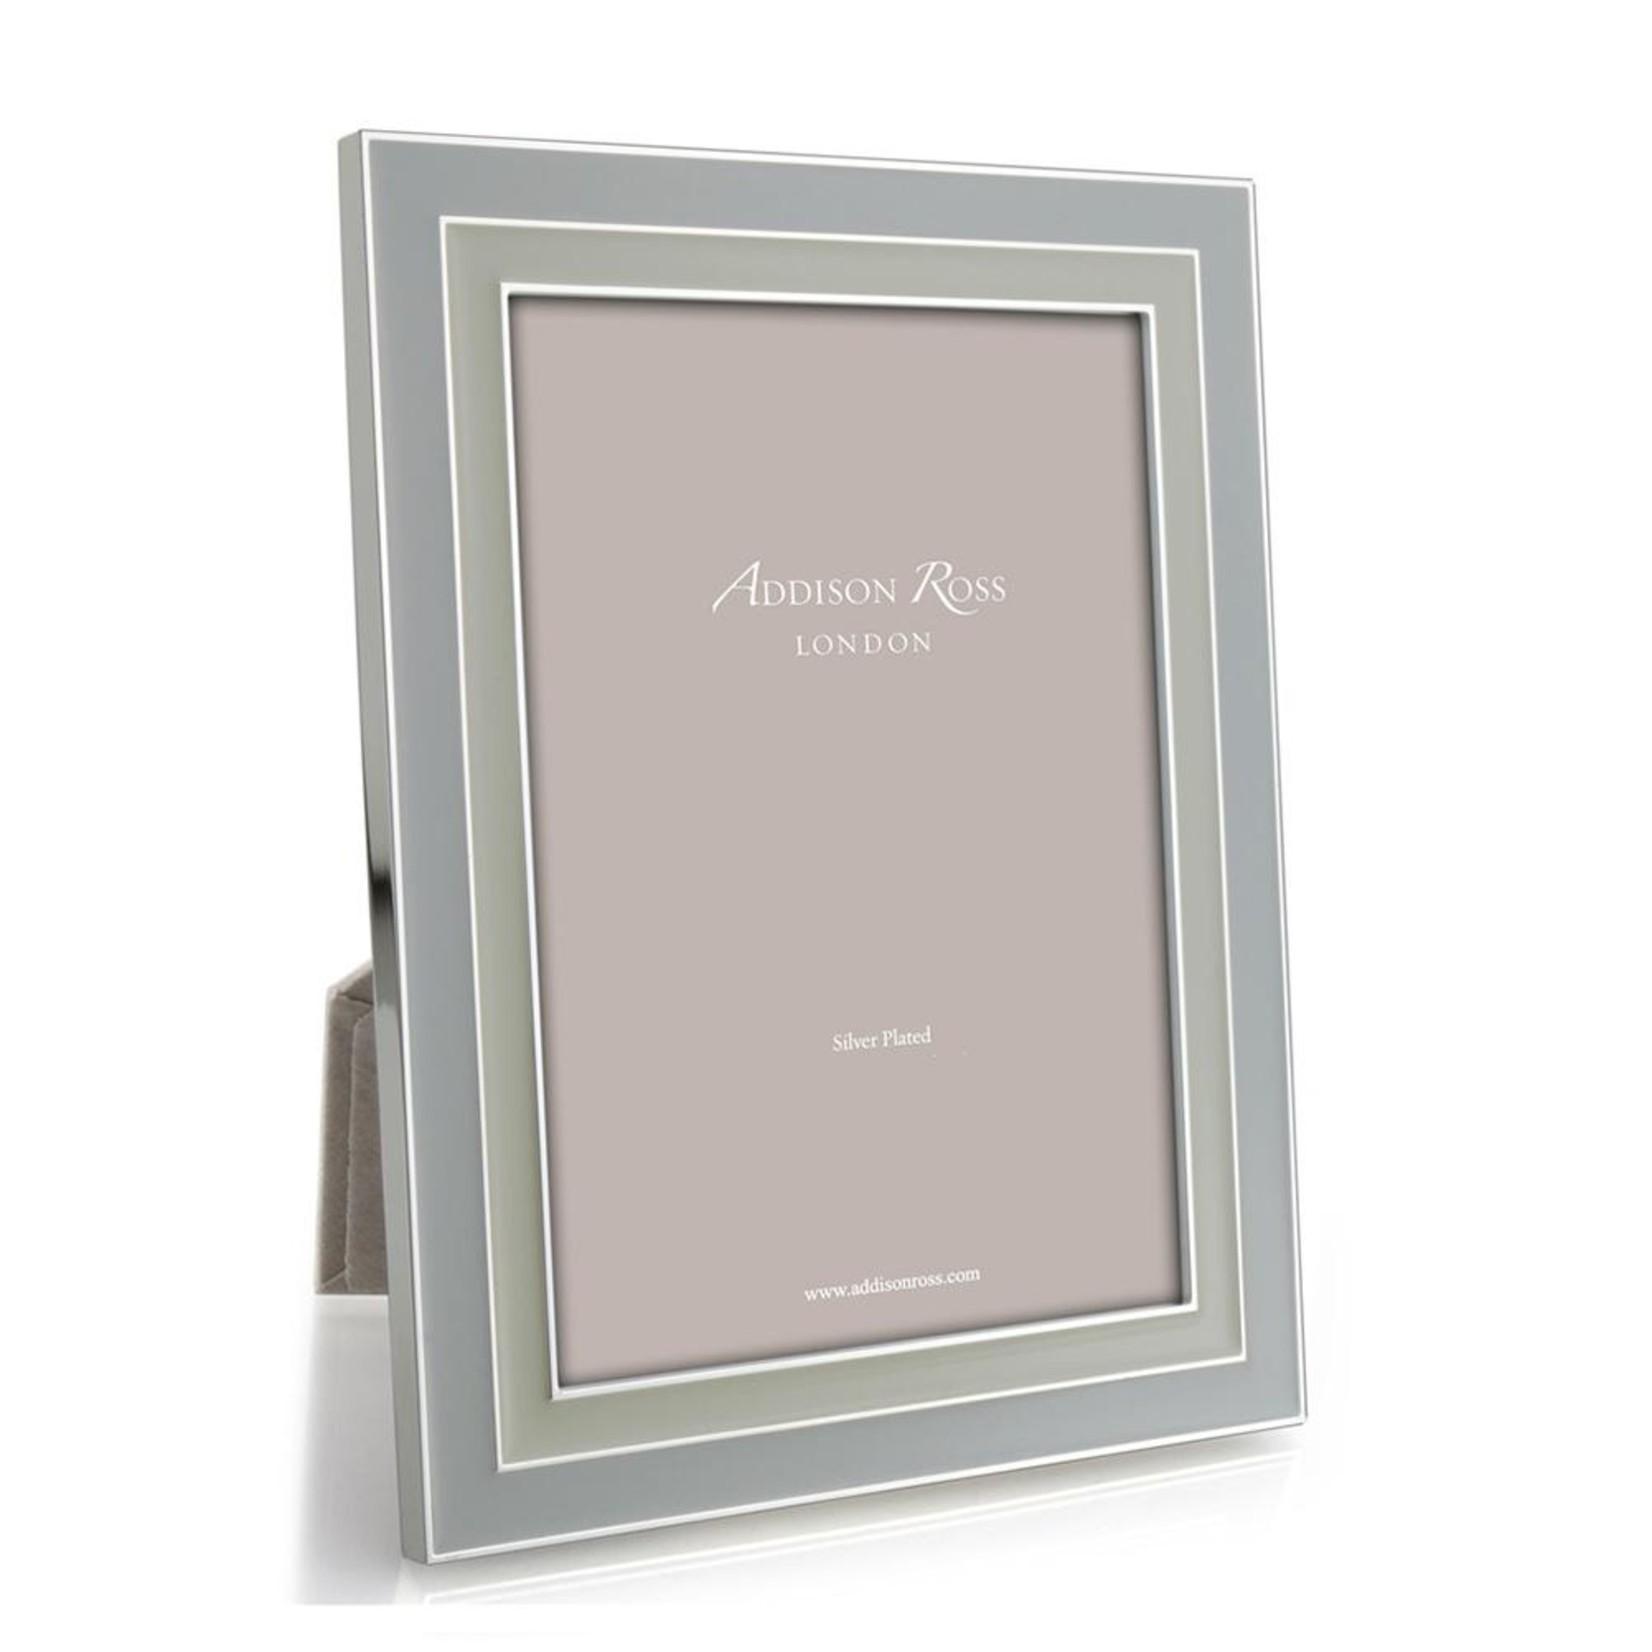 Addison Ross Manhattan Dove Grey & Pebble Enamel Frame - 4x6